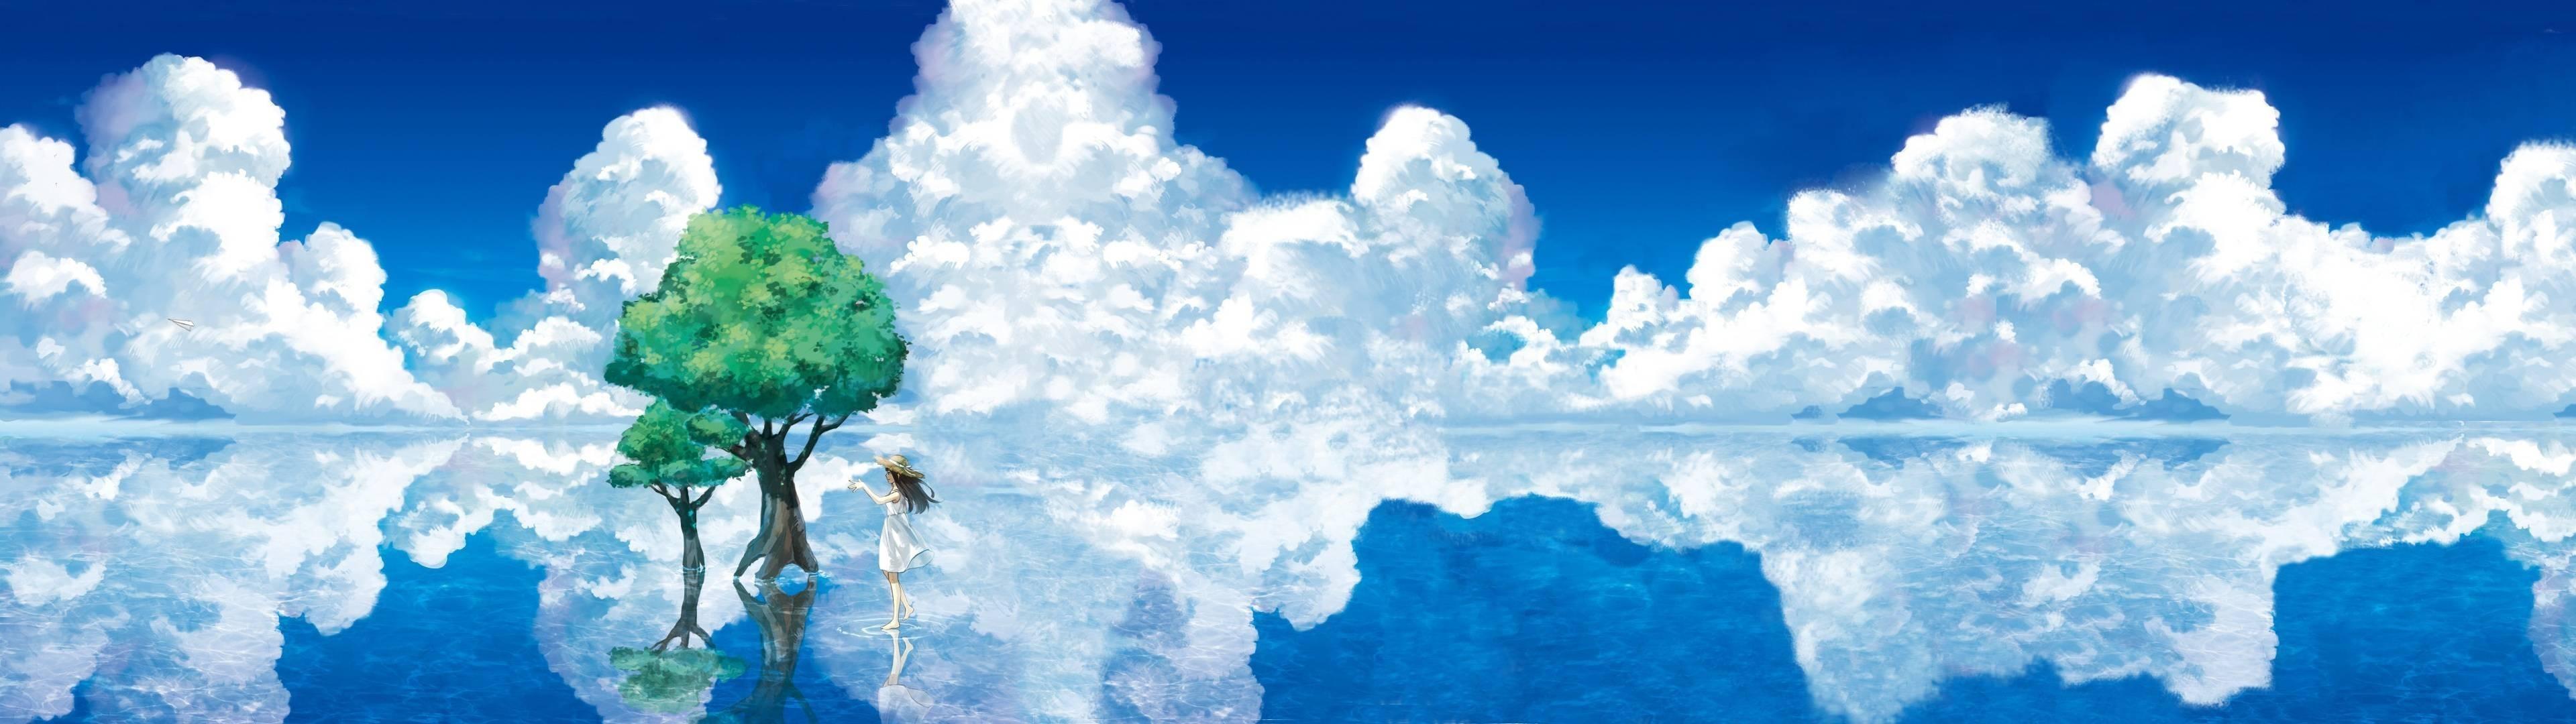 Anime Landscape Dual Screen Wallpaper Download Hd Images - 4k Dual Monitor Wallpaper Anime - HD Wallpaper